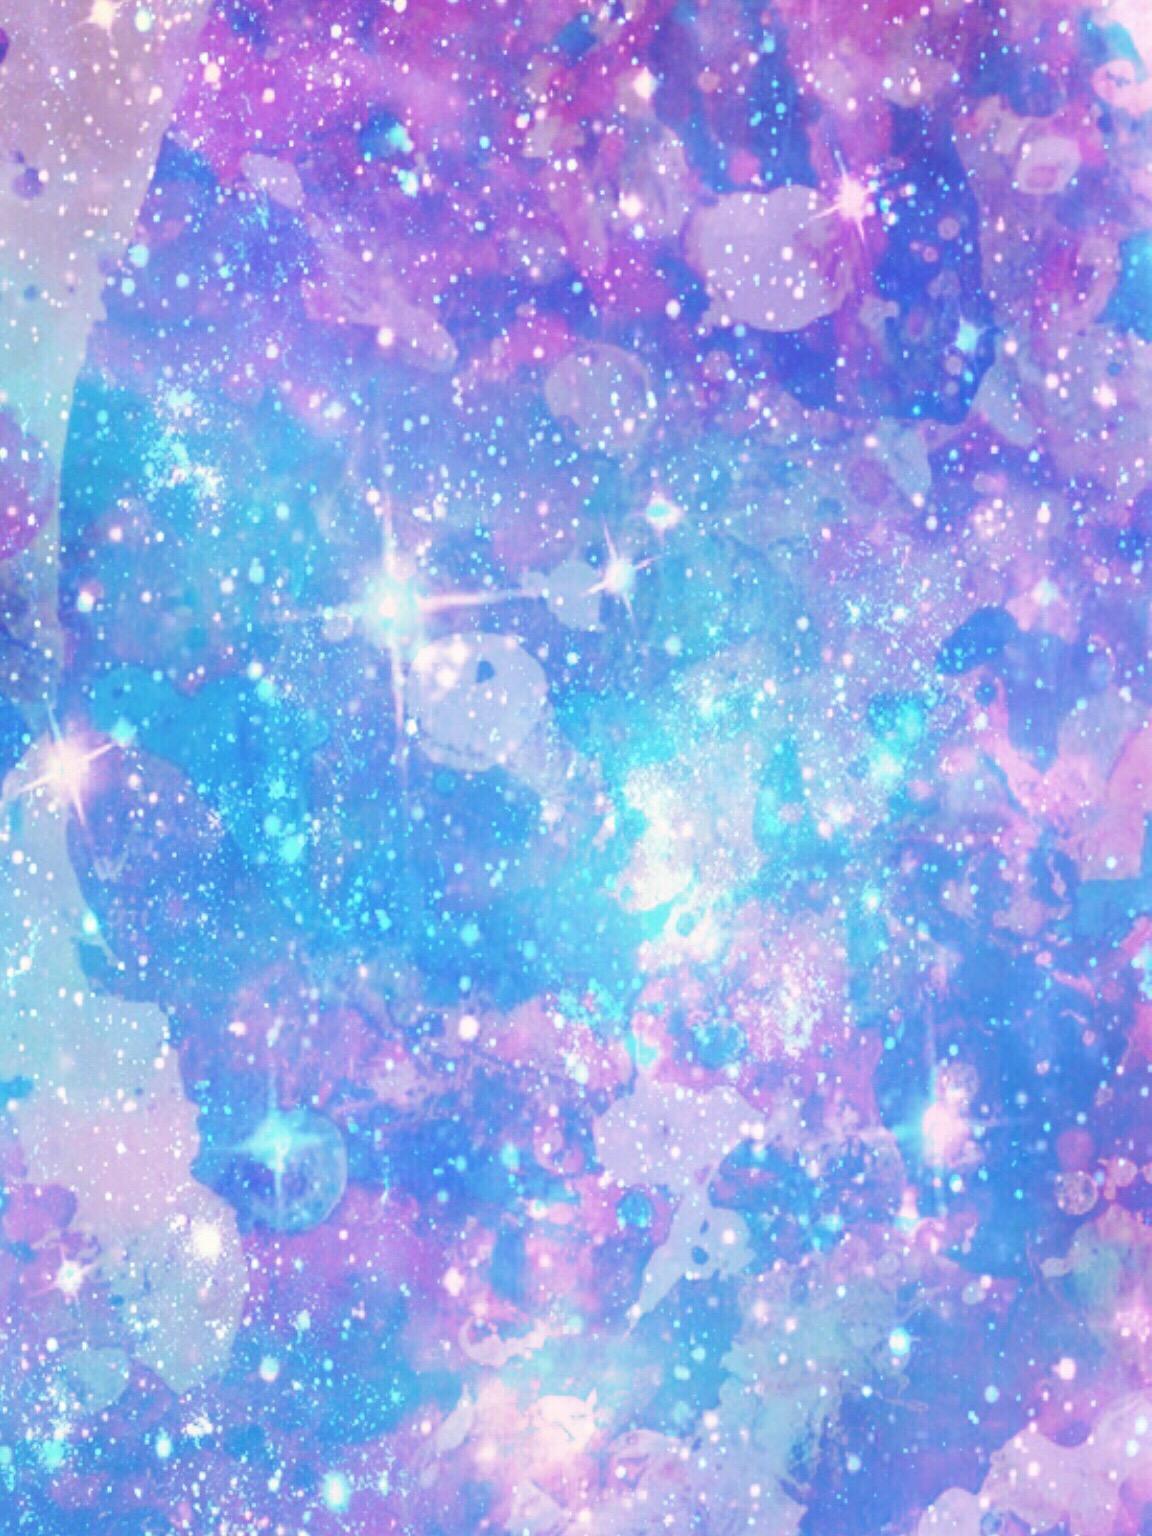 freetoedit glitter sparkle colorful galaxy cute girly